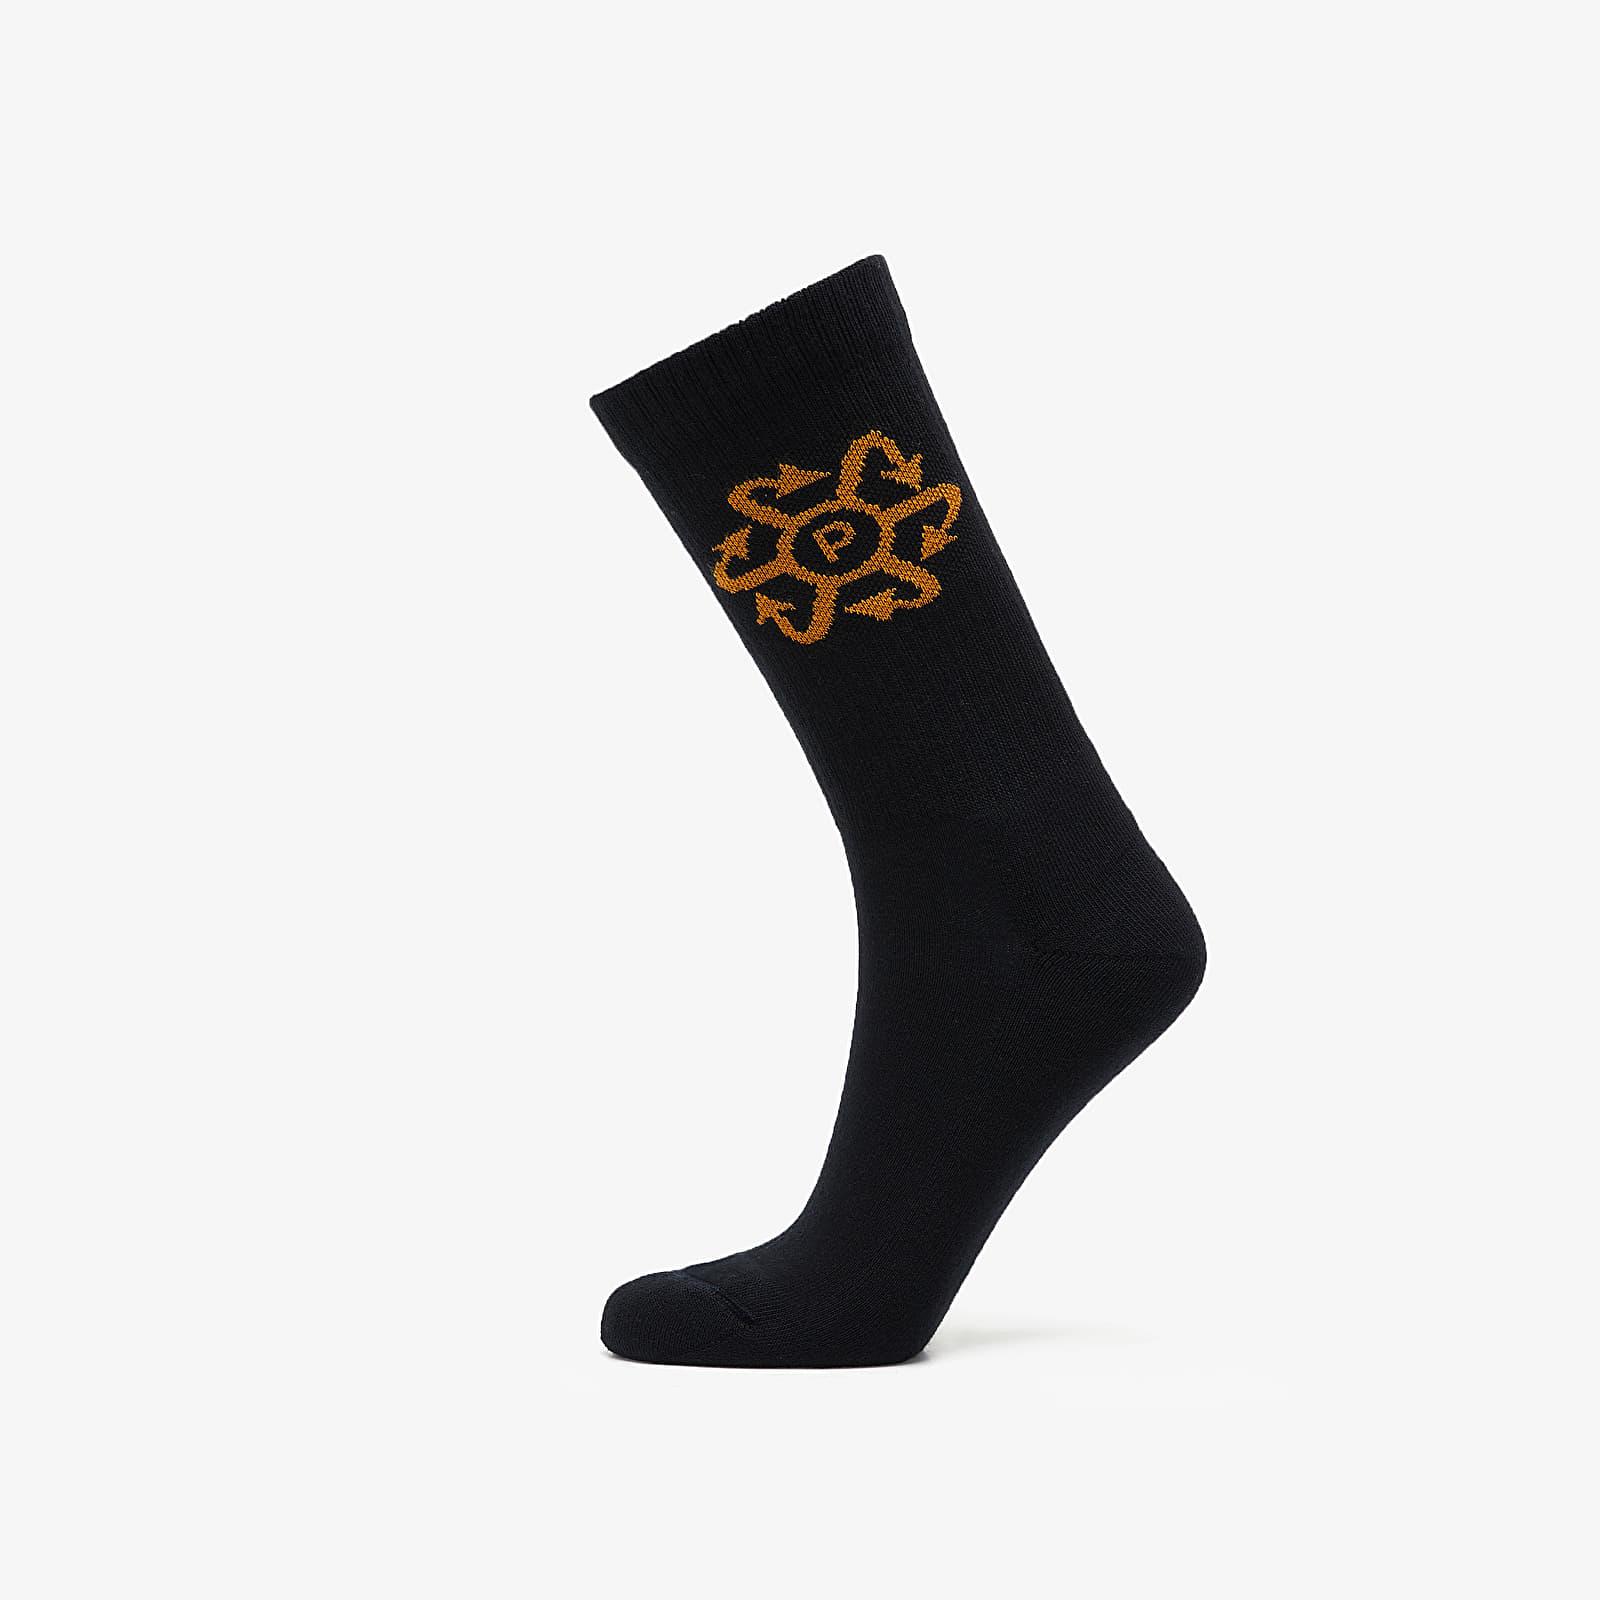 Chaussettes PACCBET Two Tone Jaquard Socks Black/ Tan